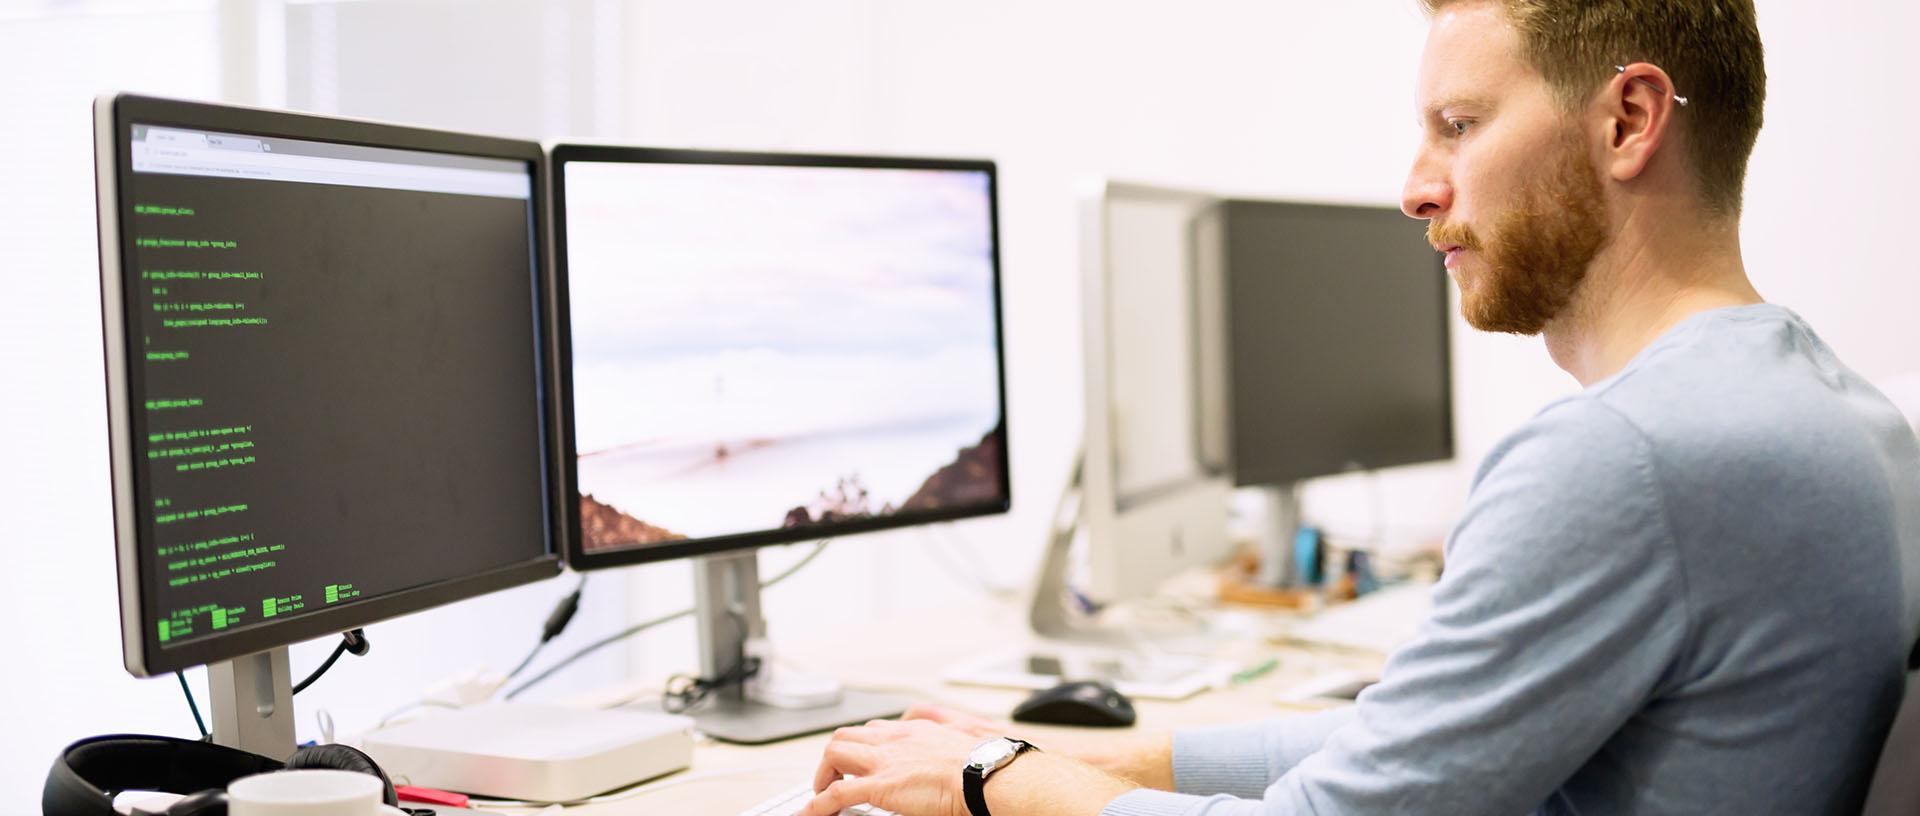 atts computer studies